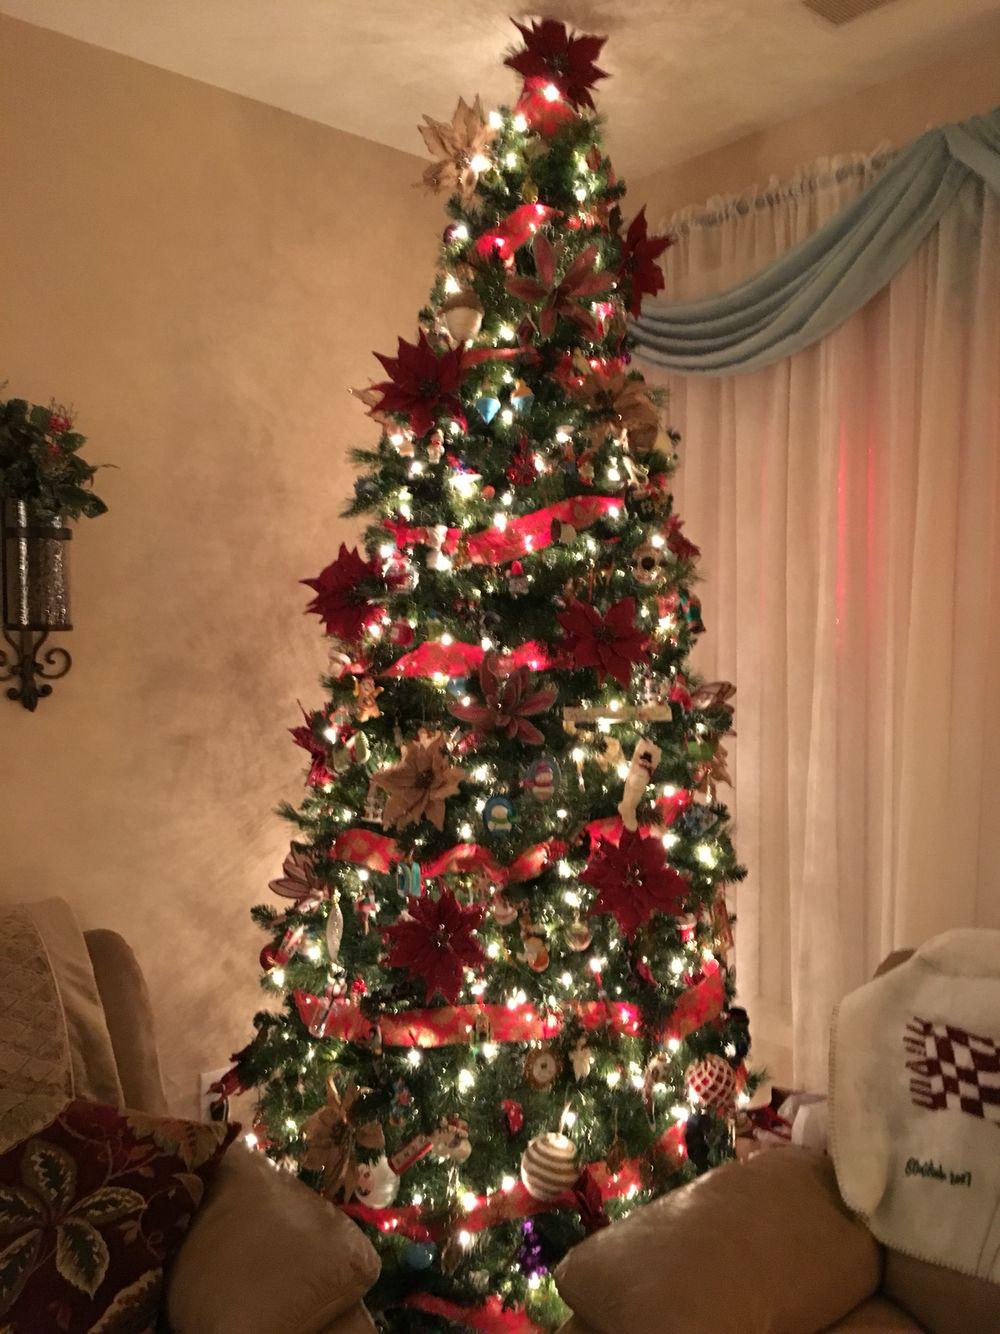 2015 main christmas tree with burlap ribbon and poinsettias - Burlap Ribbon Christmas Decor